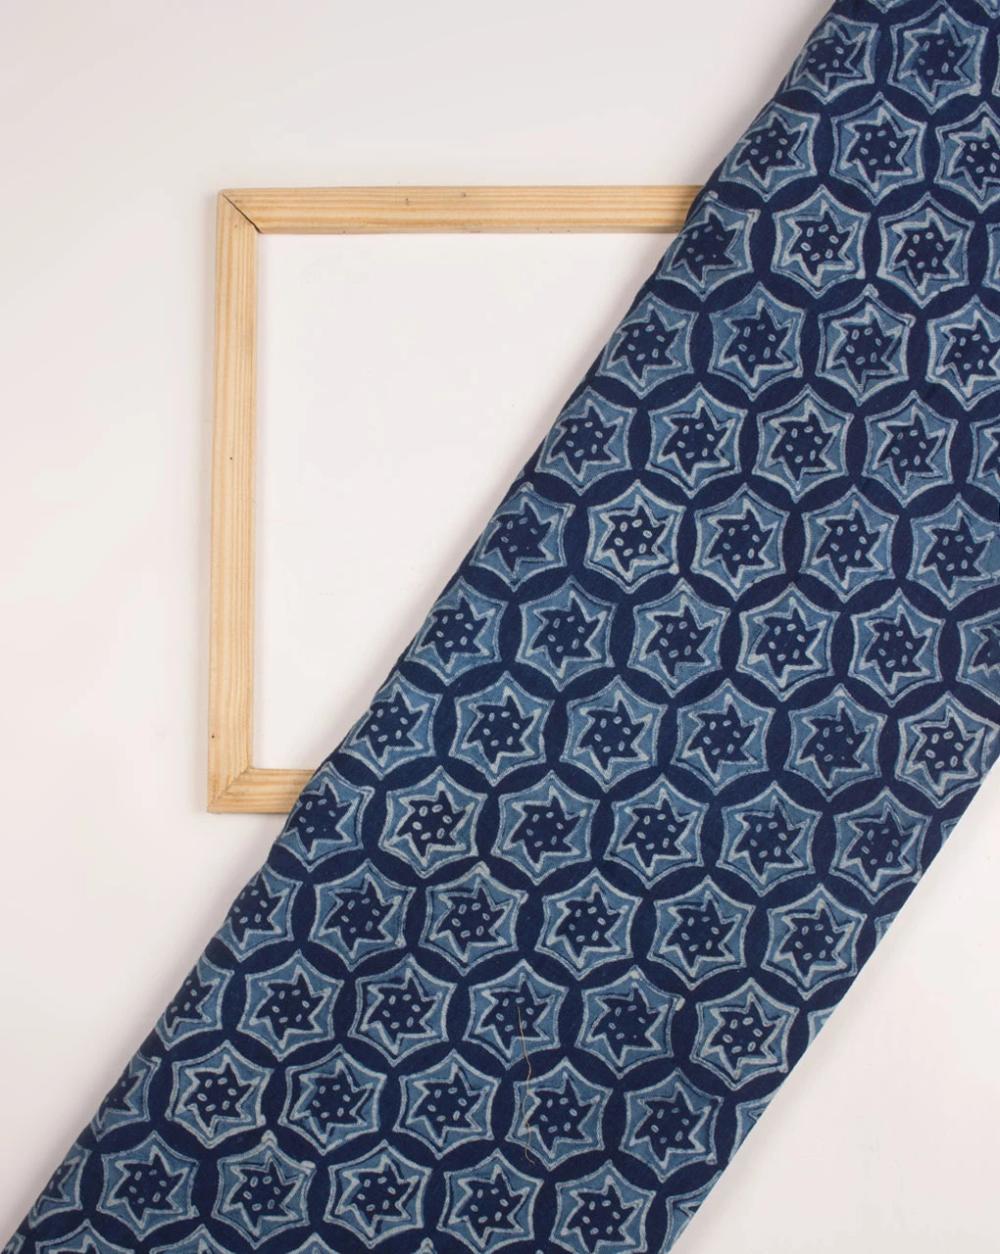 Cotton Fabric  Blue Woven Cotton Fabric  Blue Cotton Fabric  Woven Cotton Fabric  Blue Geometric